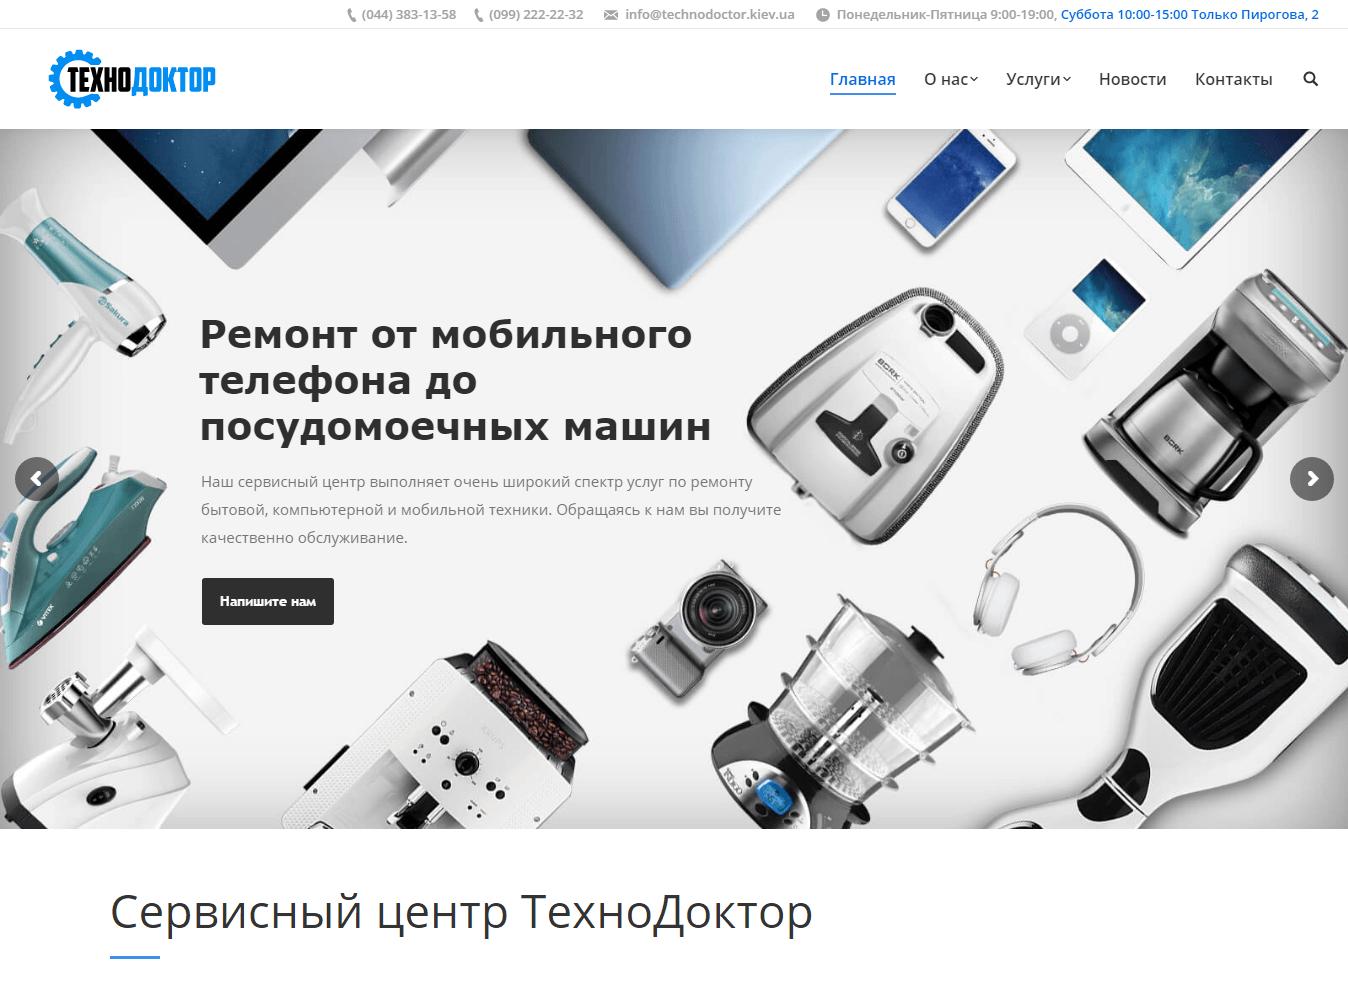 Корпоративный сайт сети сервисных центров техники